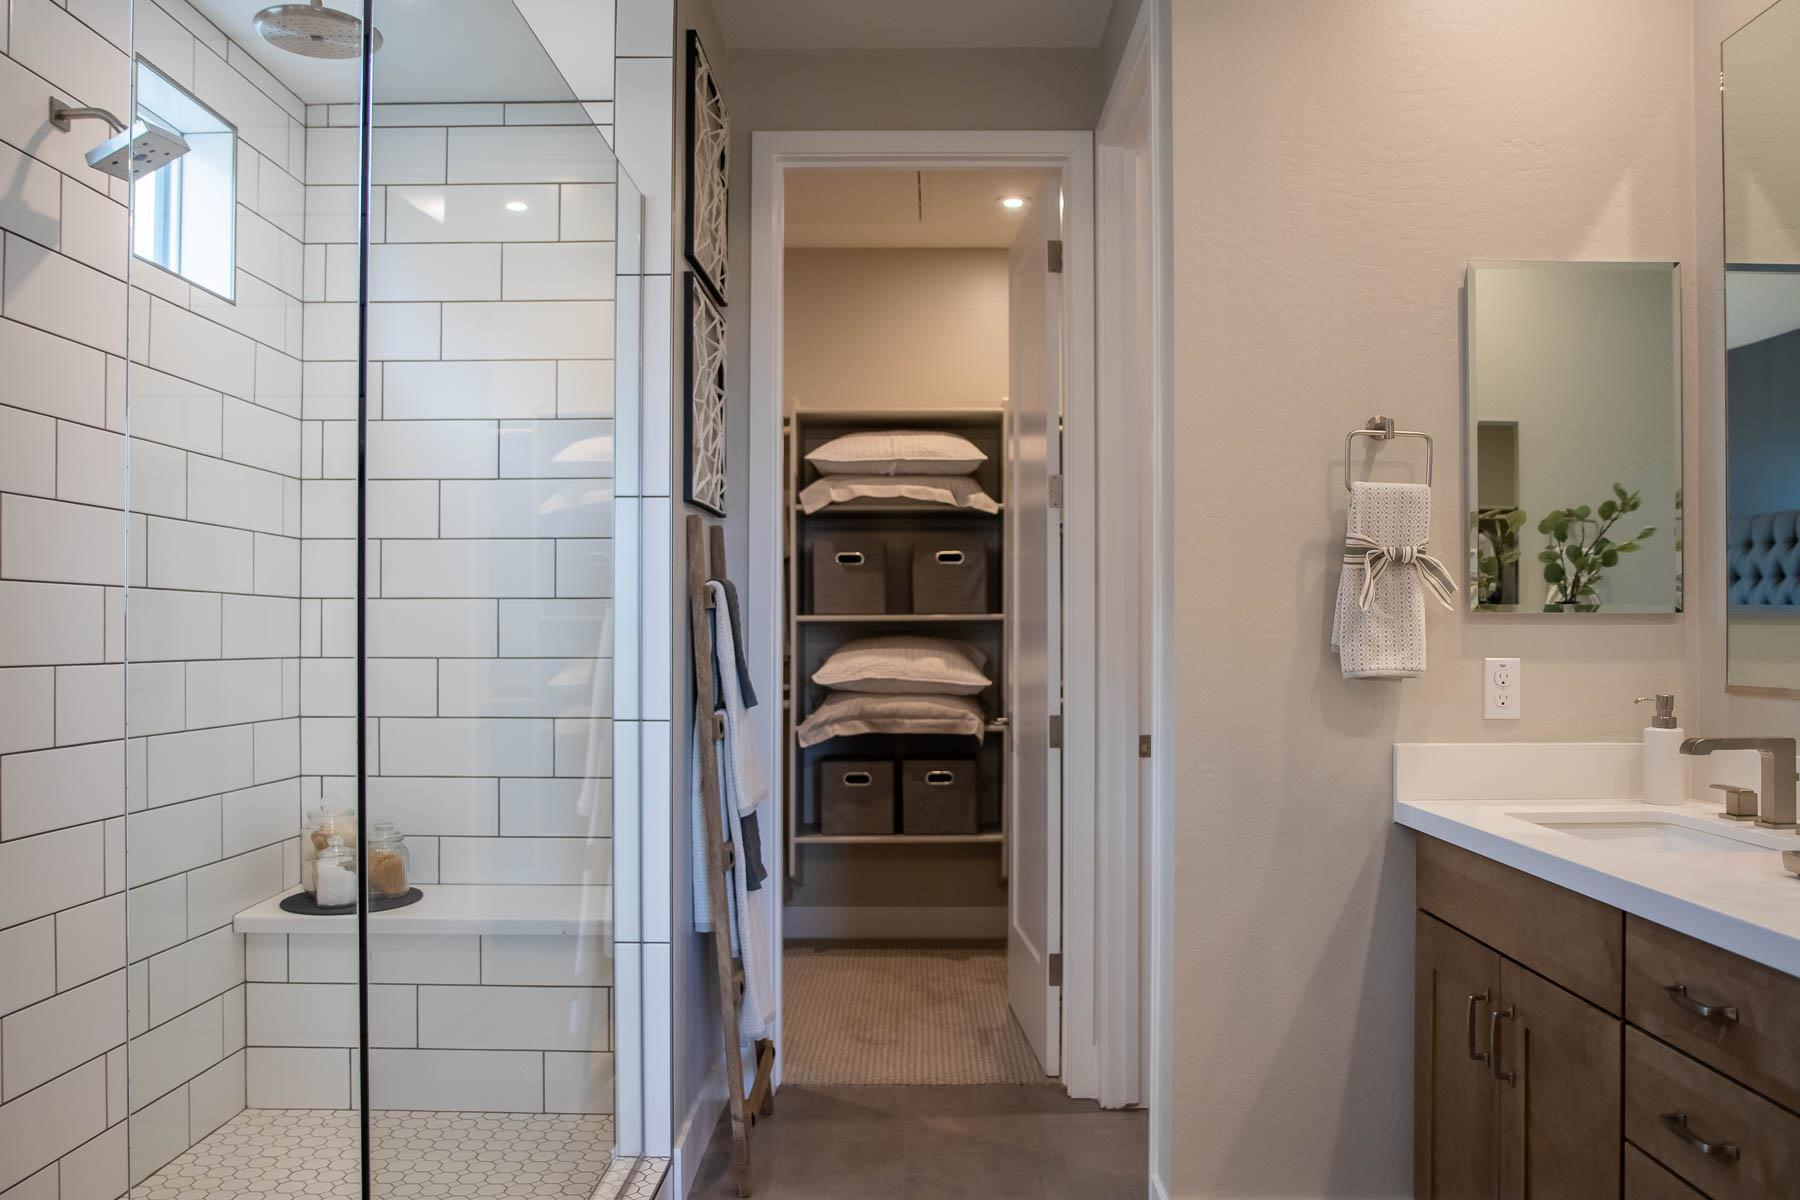 Bathroom featured in the J603 By Mandalay Homes in Prescott, AZ